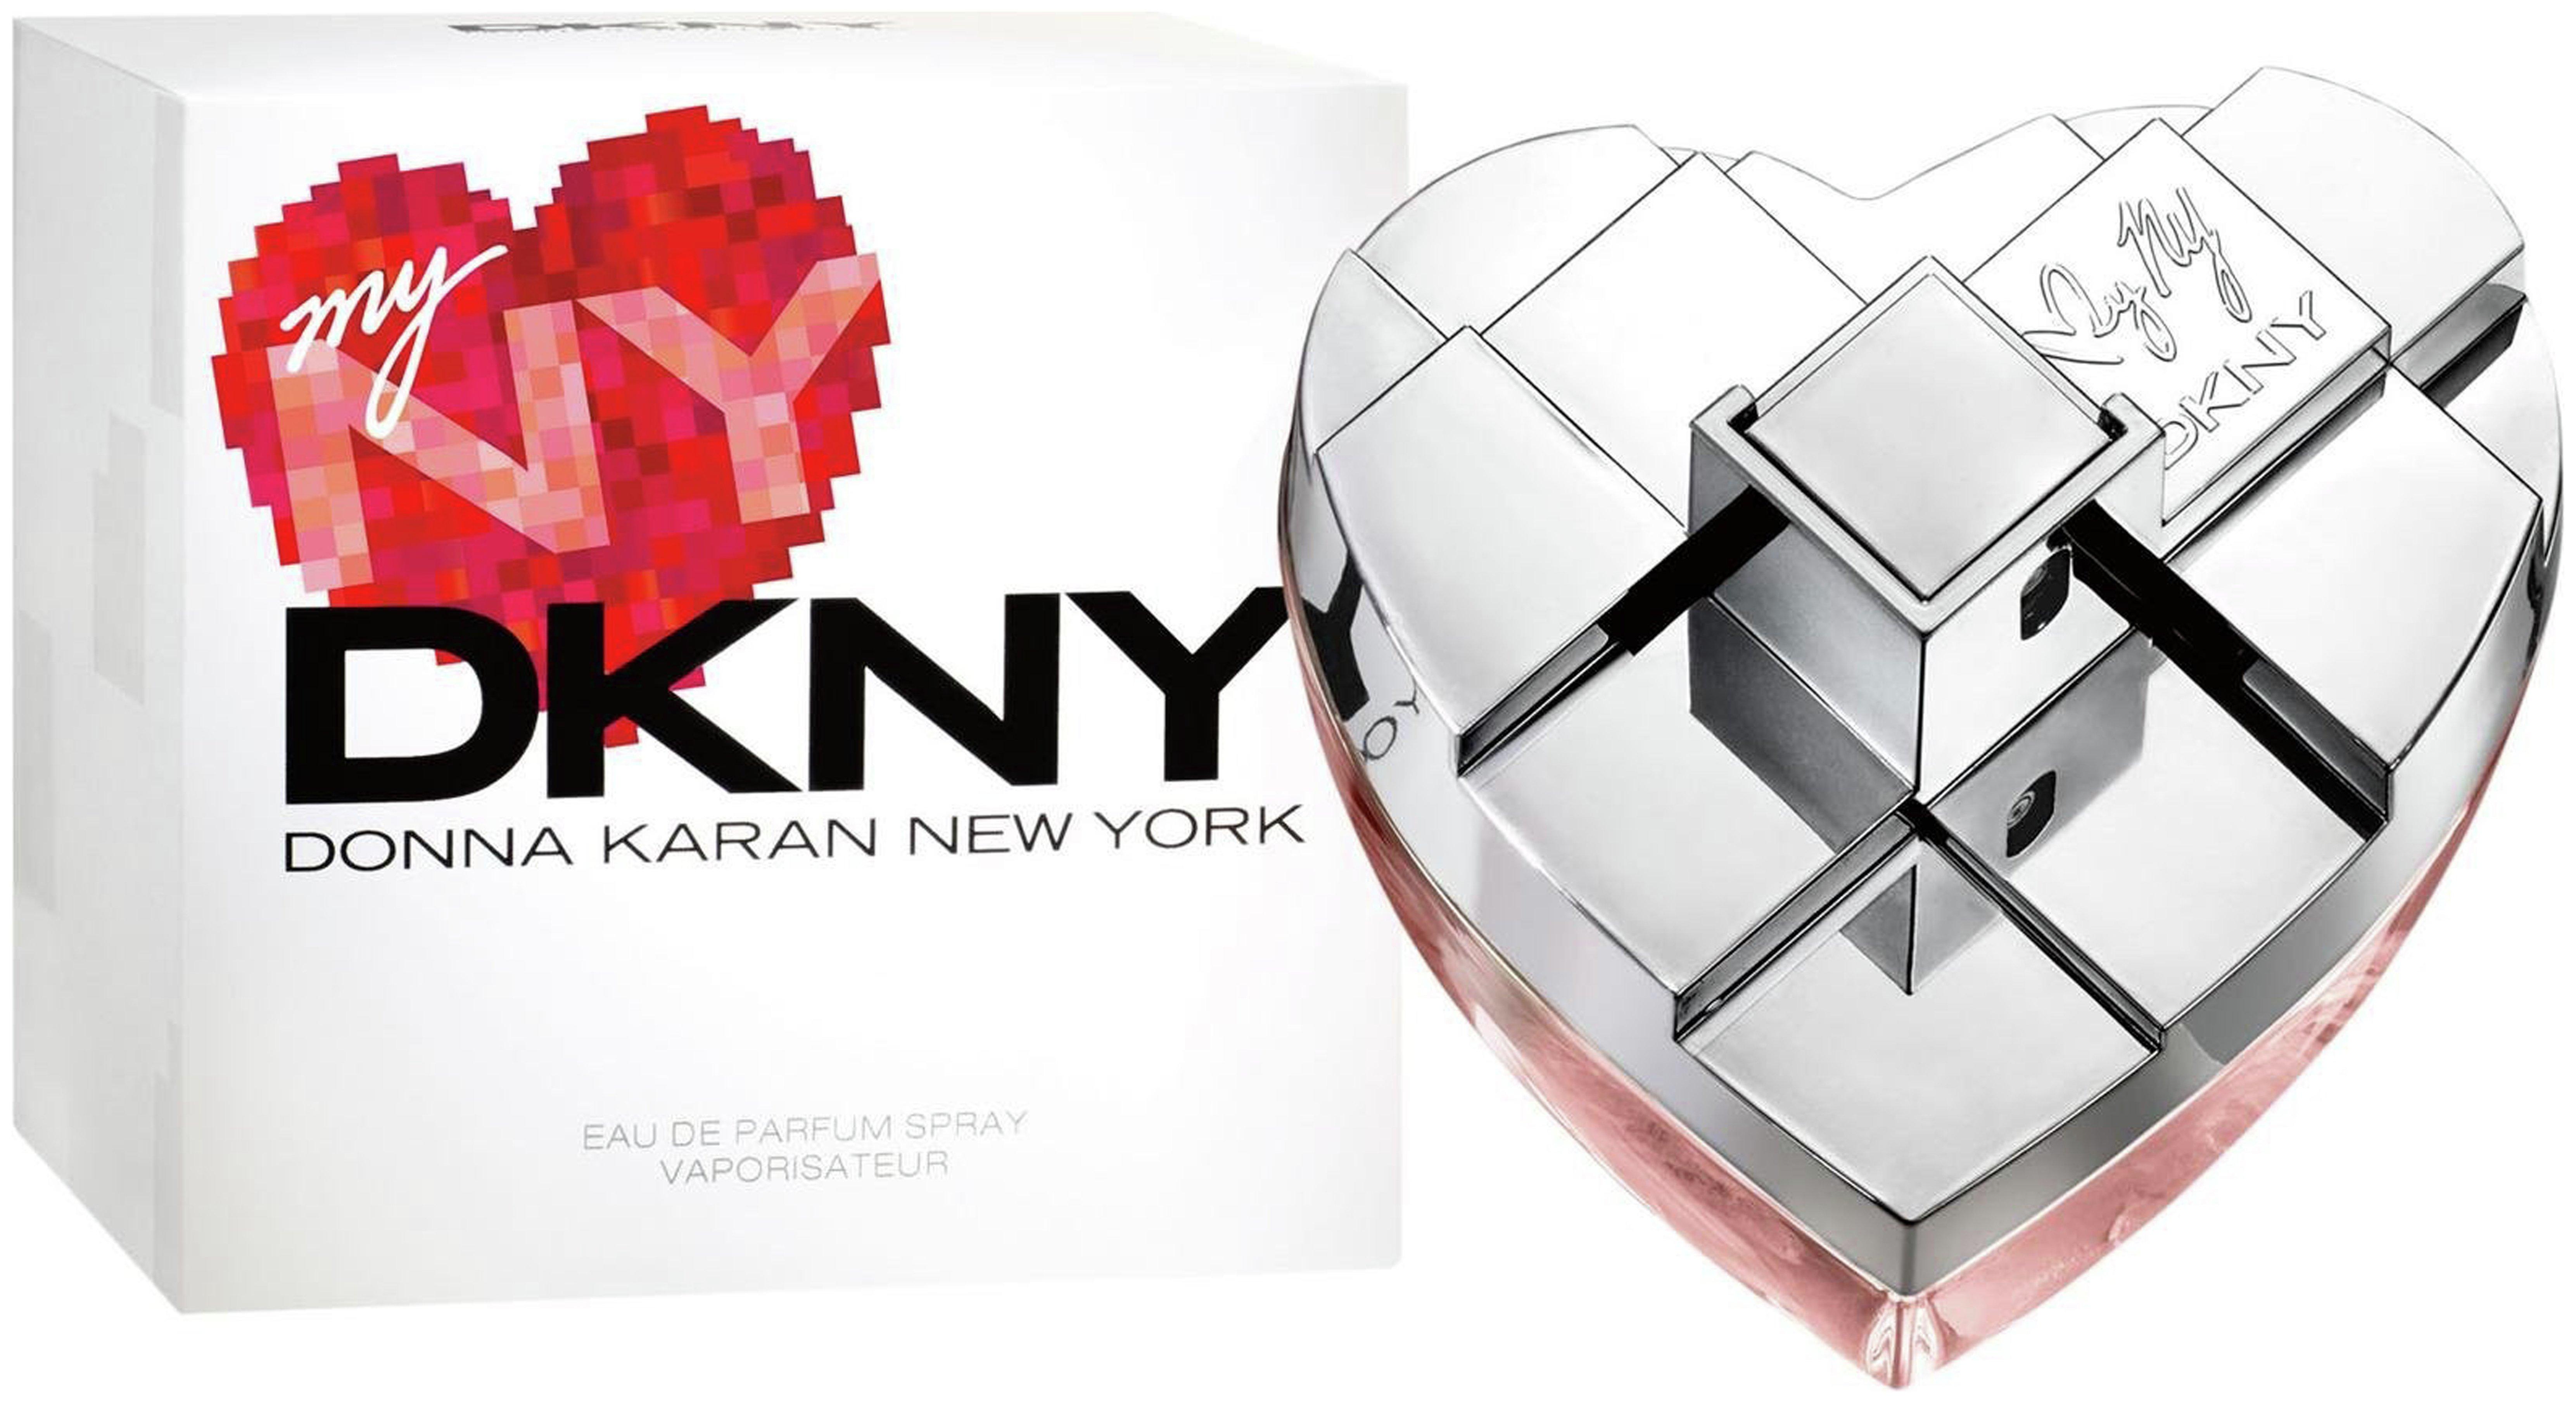 dkny-myny-eau-de-parfum-for-women-50ml